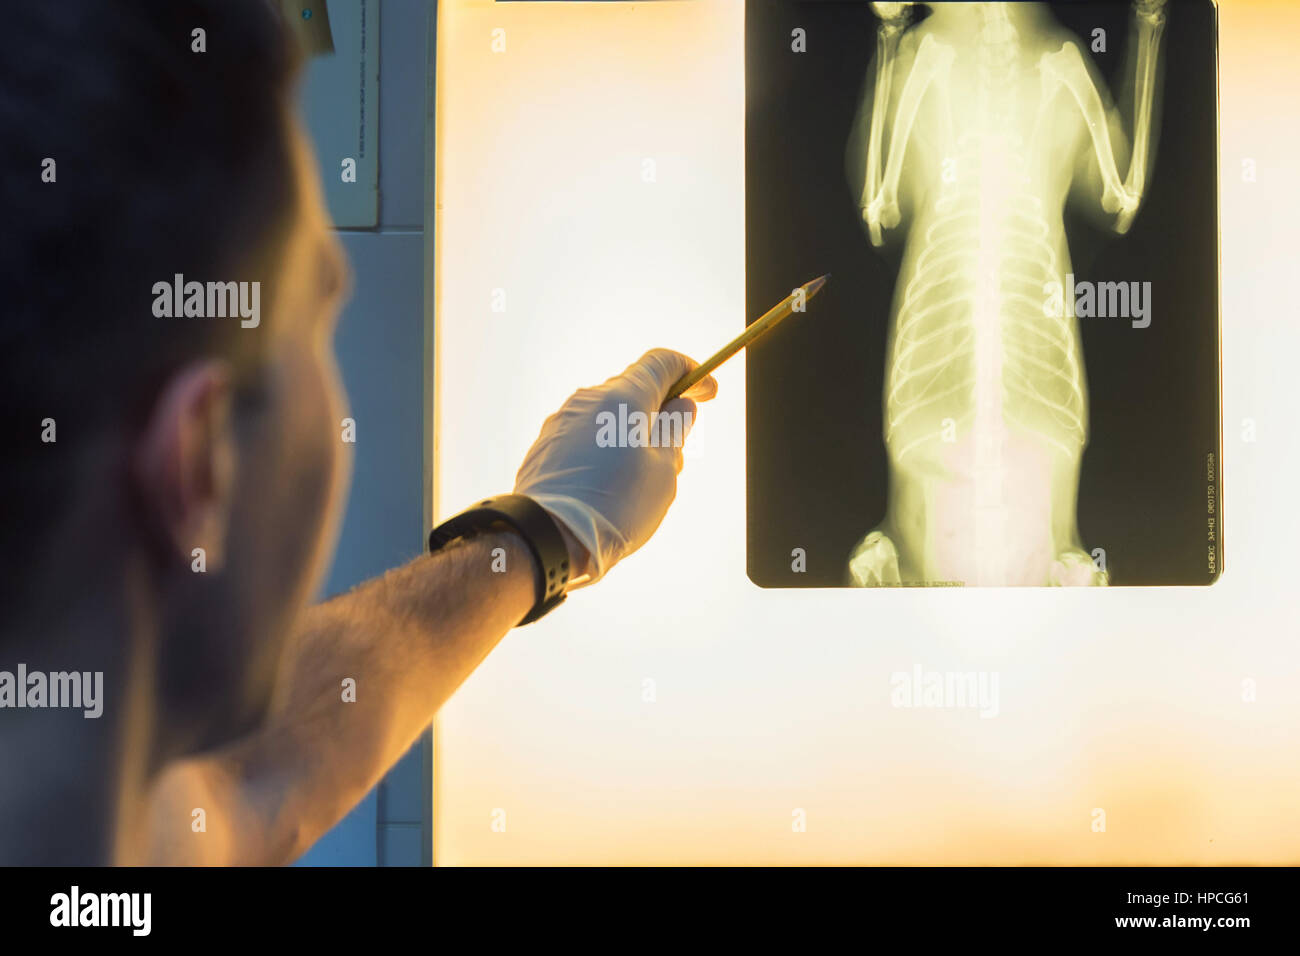 Veterinary doctor examining pet radiograph - Stock Image